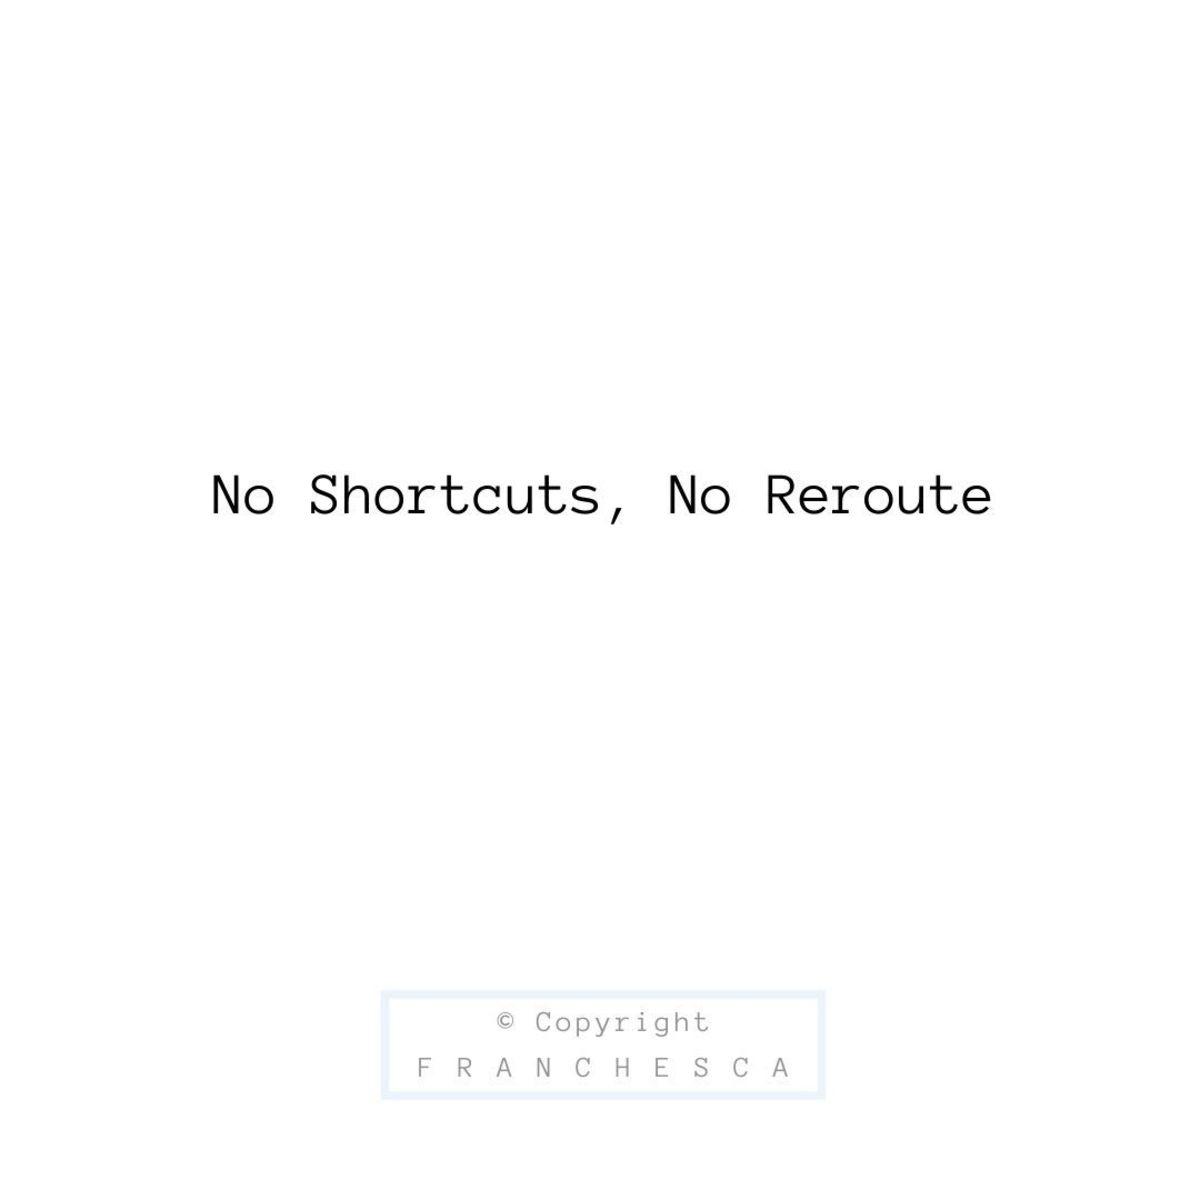 187th Article: No Shortcuts, No reroute